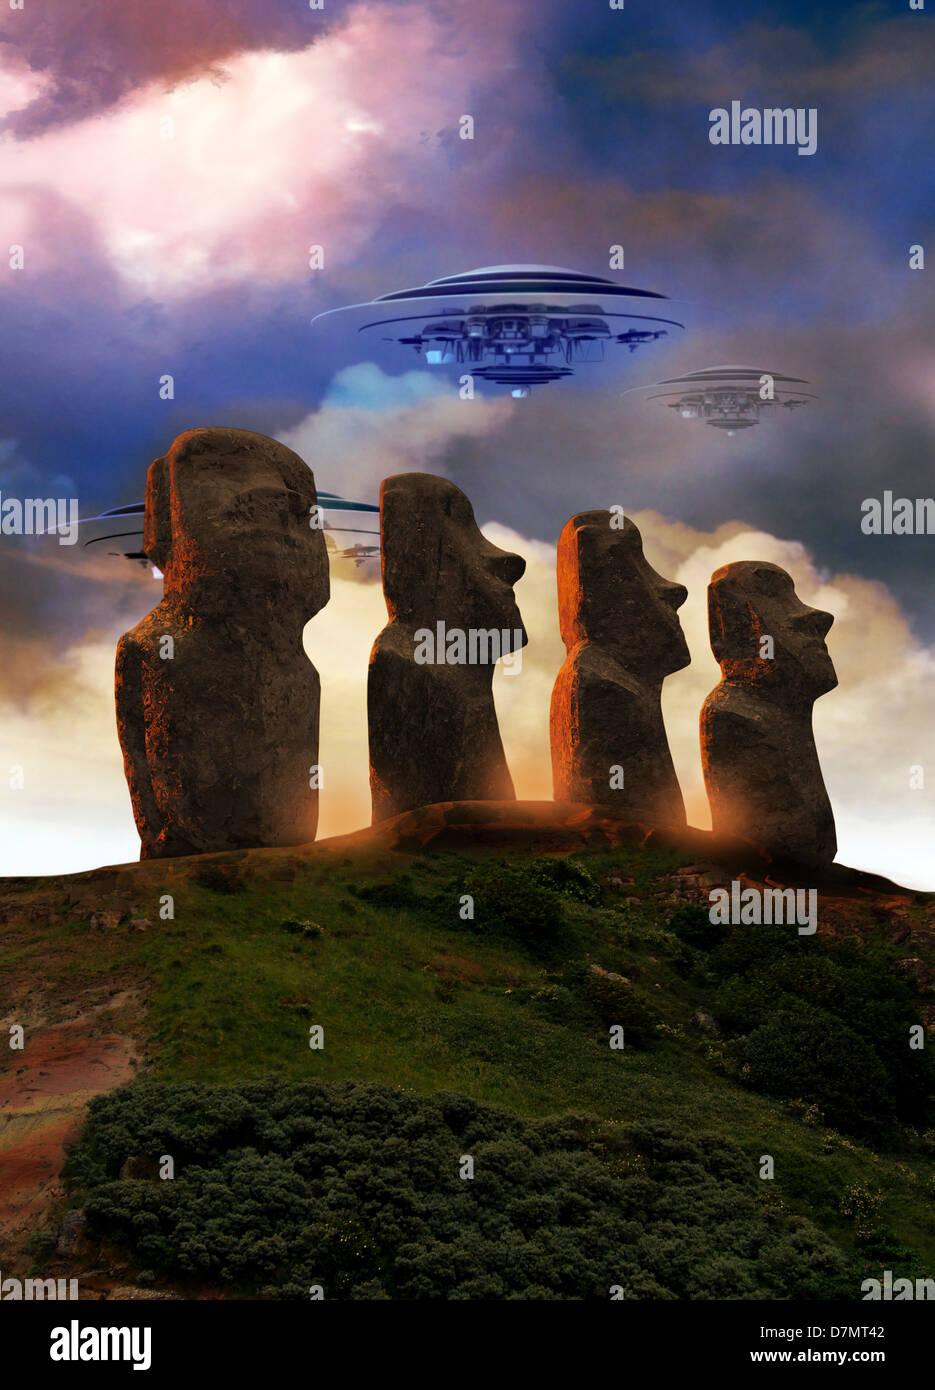 UFOs over Easter Island, artwork - Stock Image